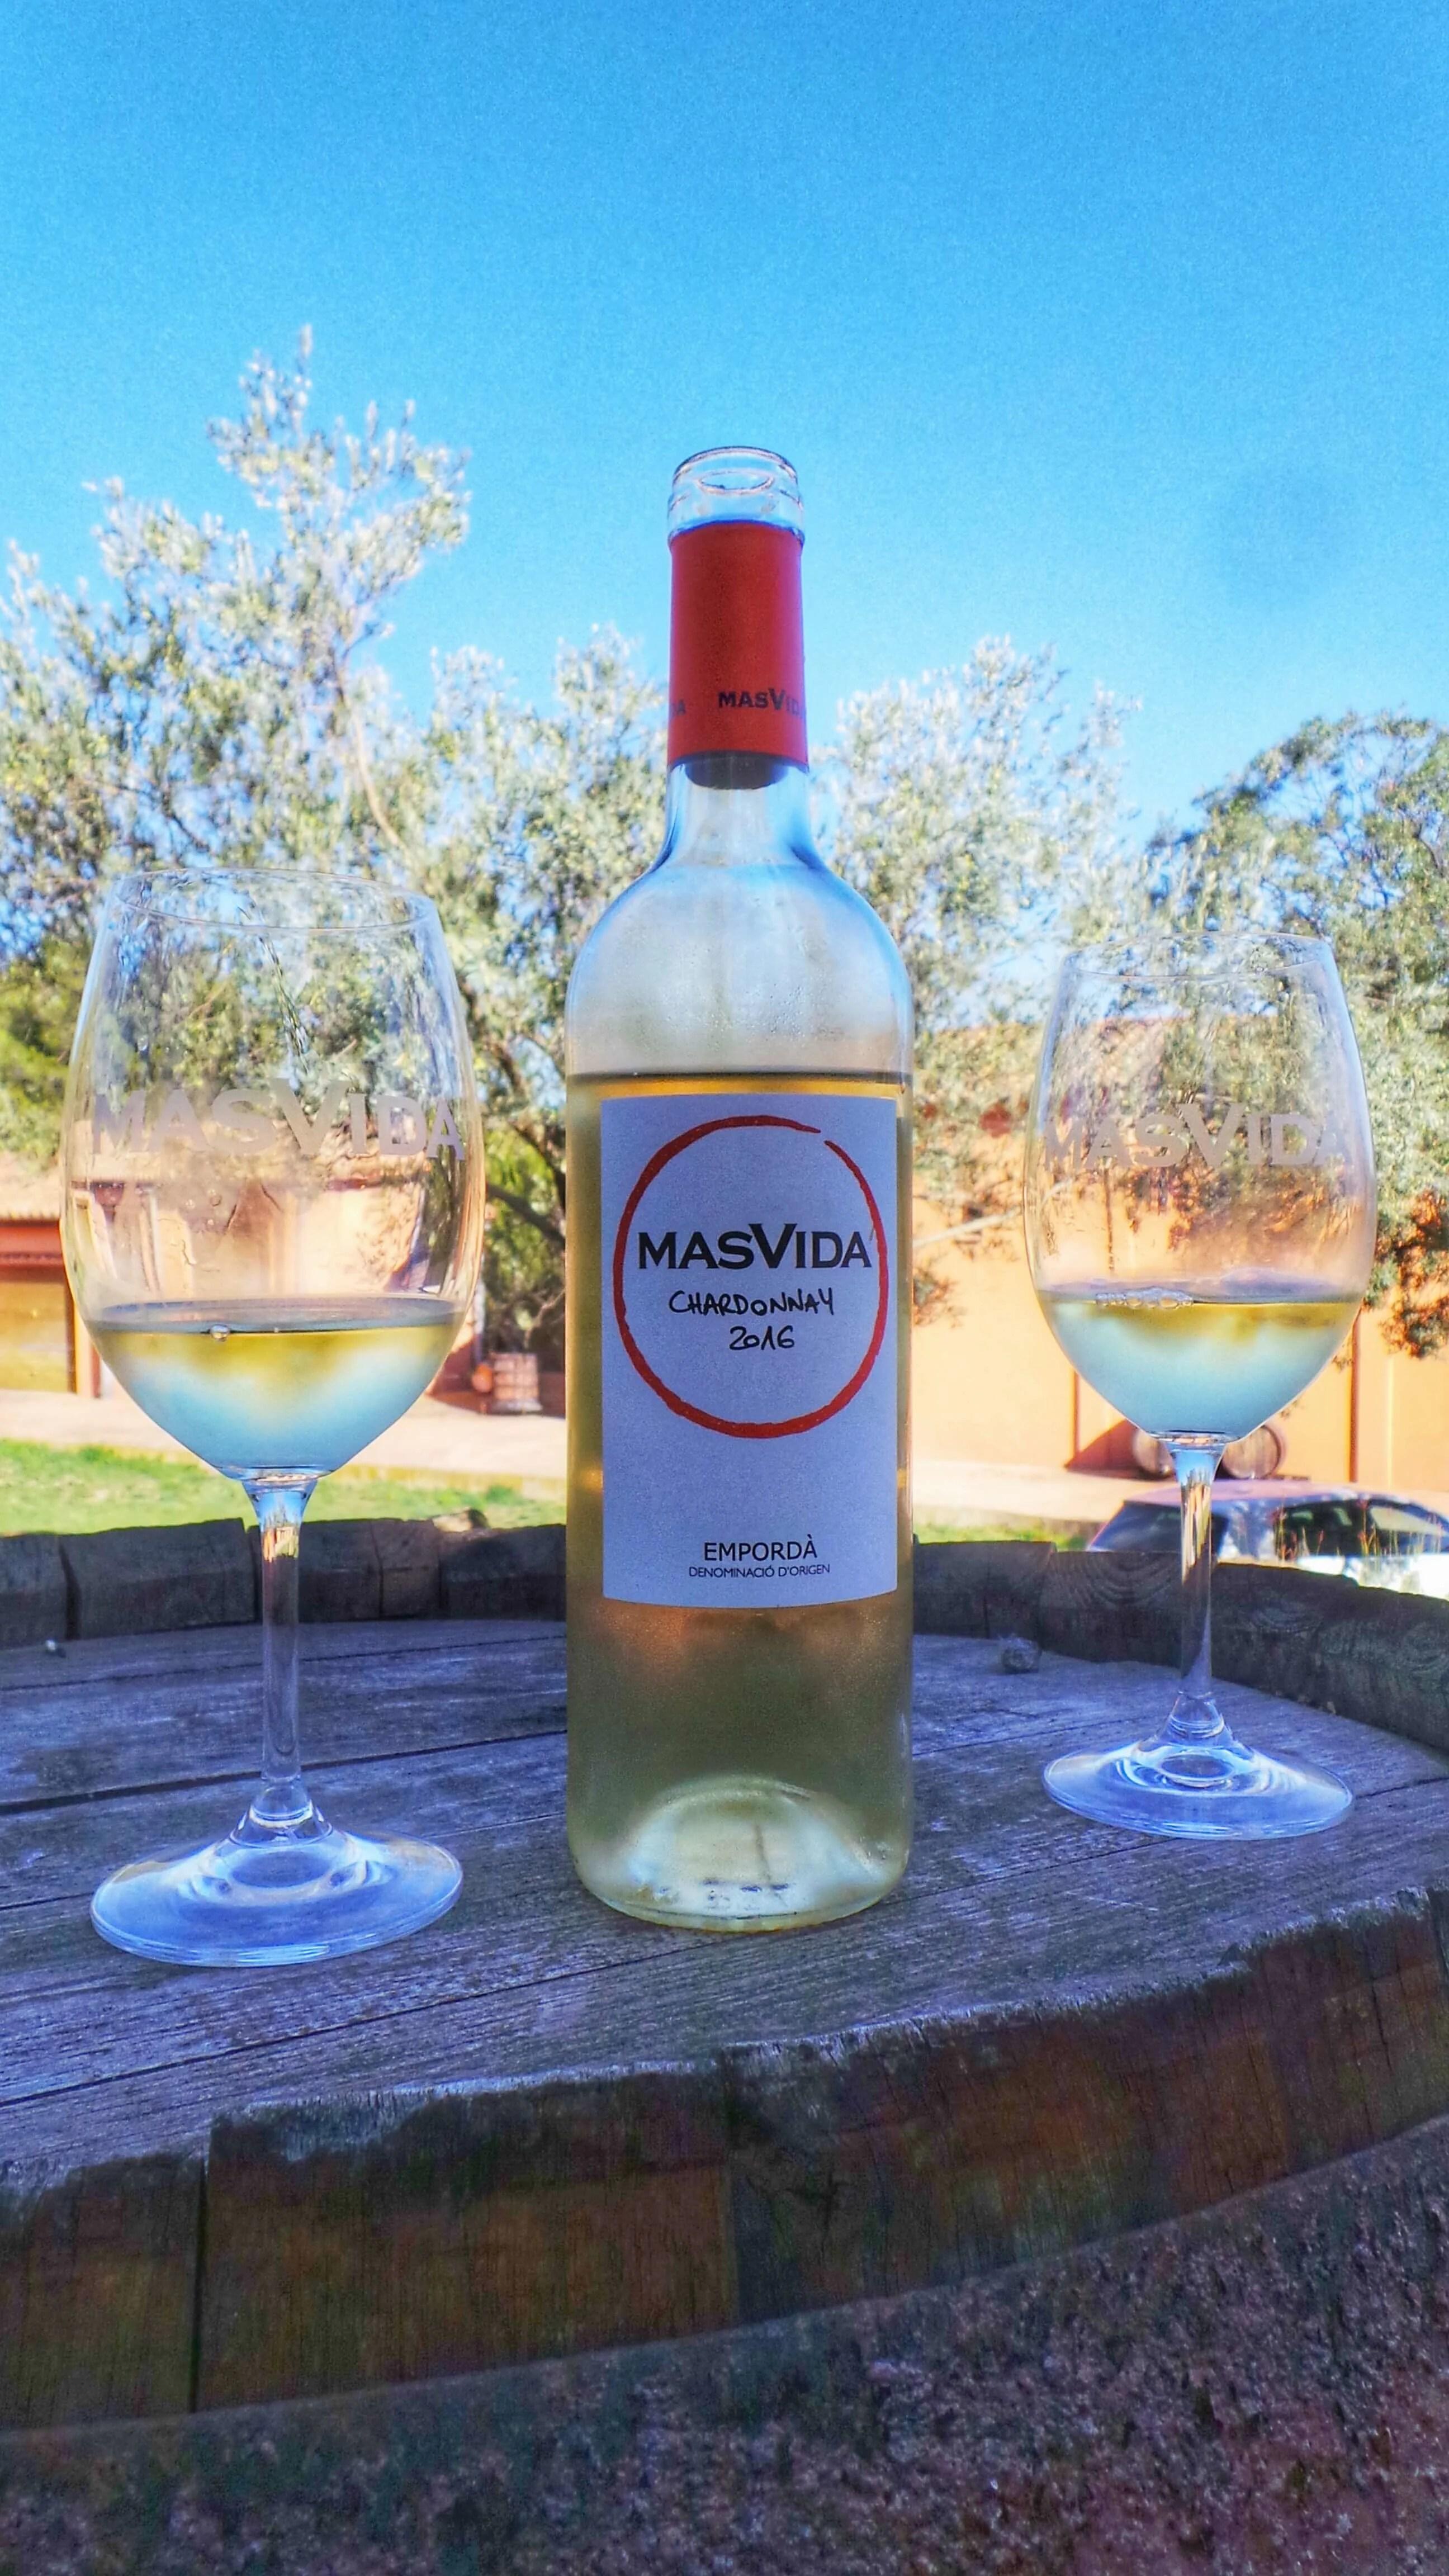 mas vida winery Cistella Costa Brava Spain